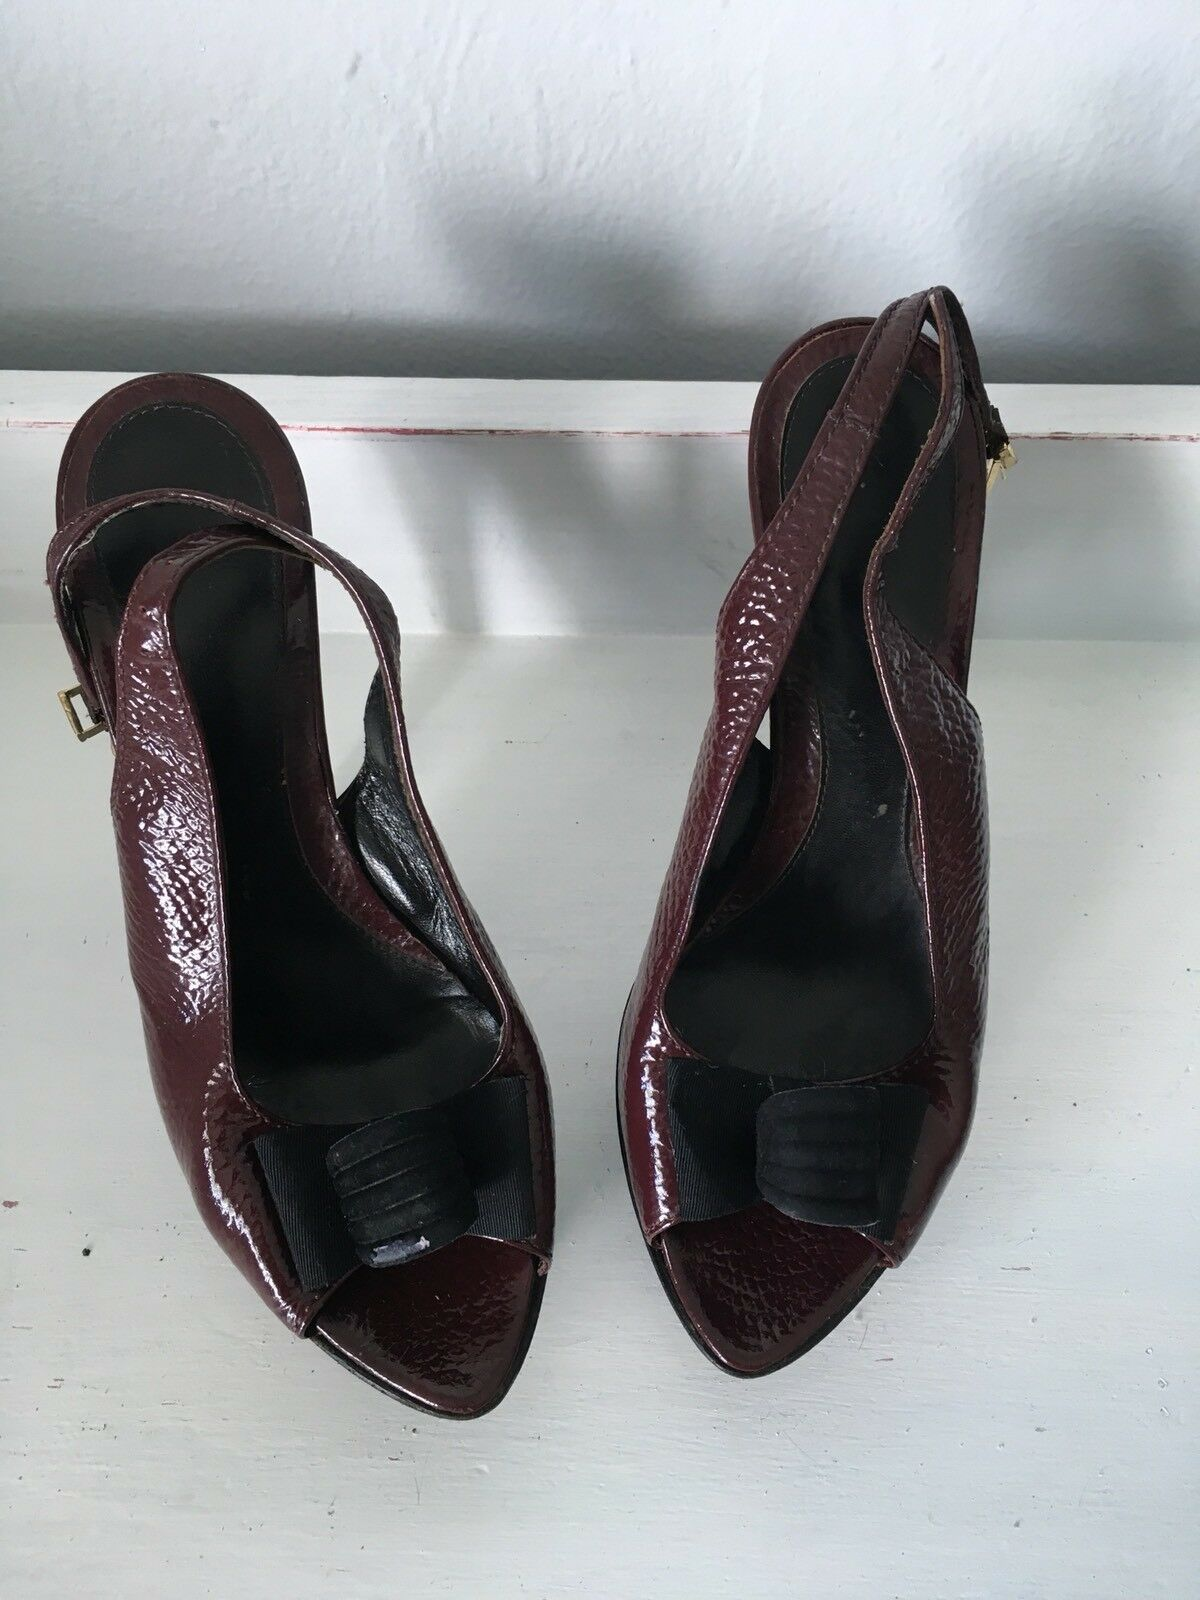 Fendi High Heels Stiletto Slingbacks Pumps Bow Patent Leather  sz 40